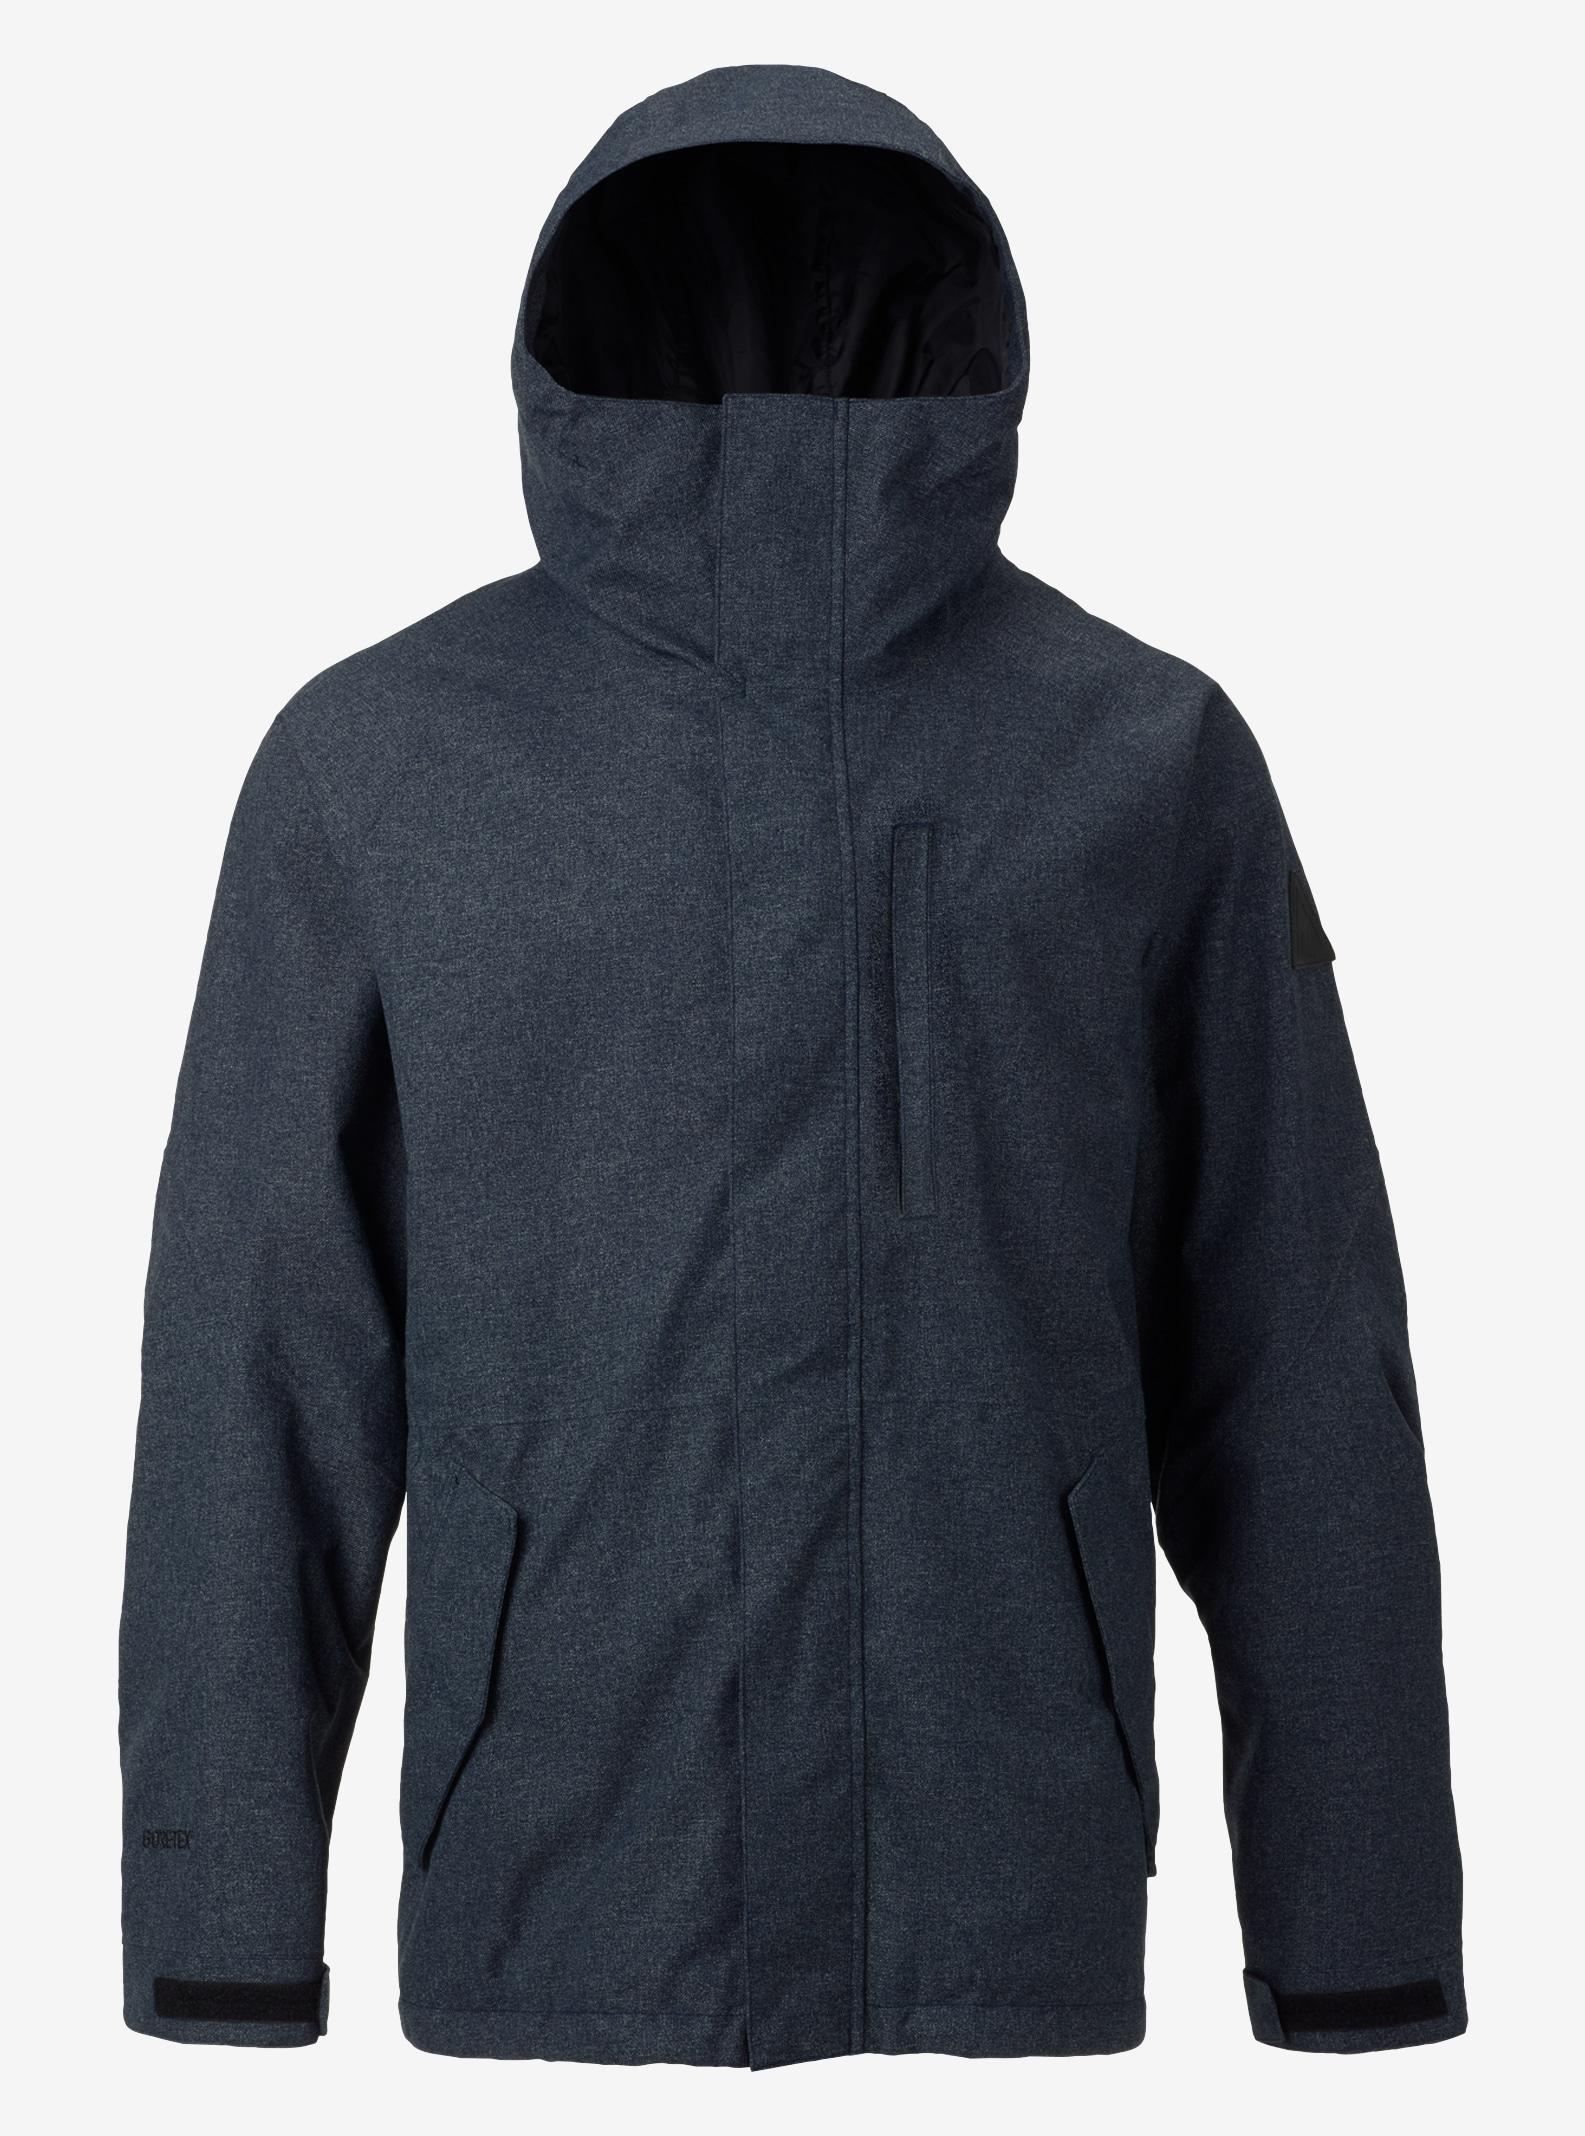 Men's Burton Radial Jacket shown in Black Iris